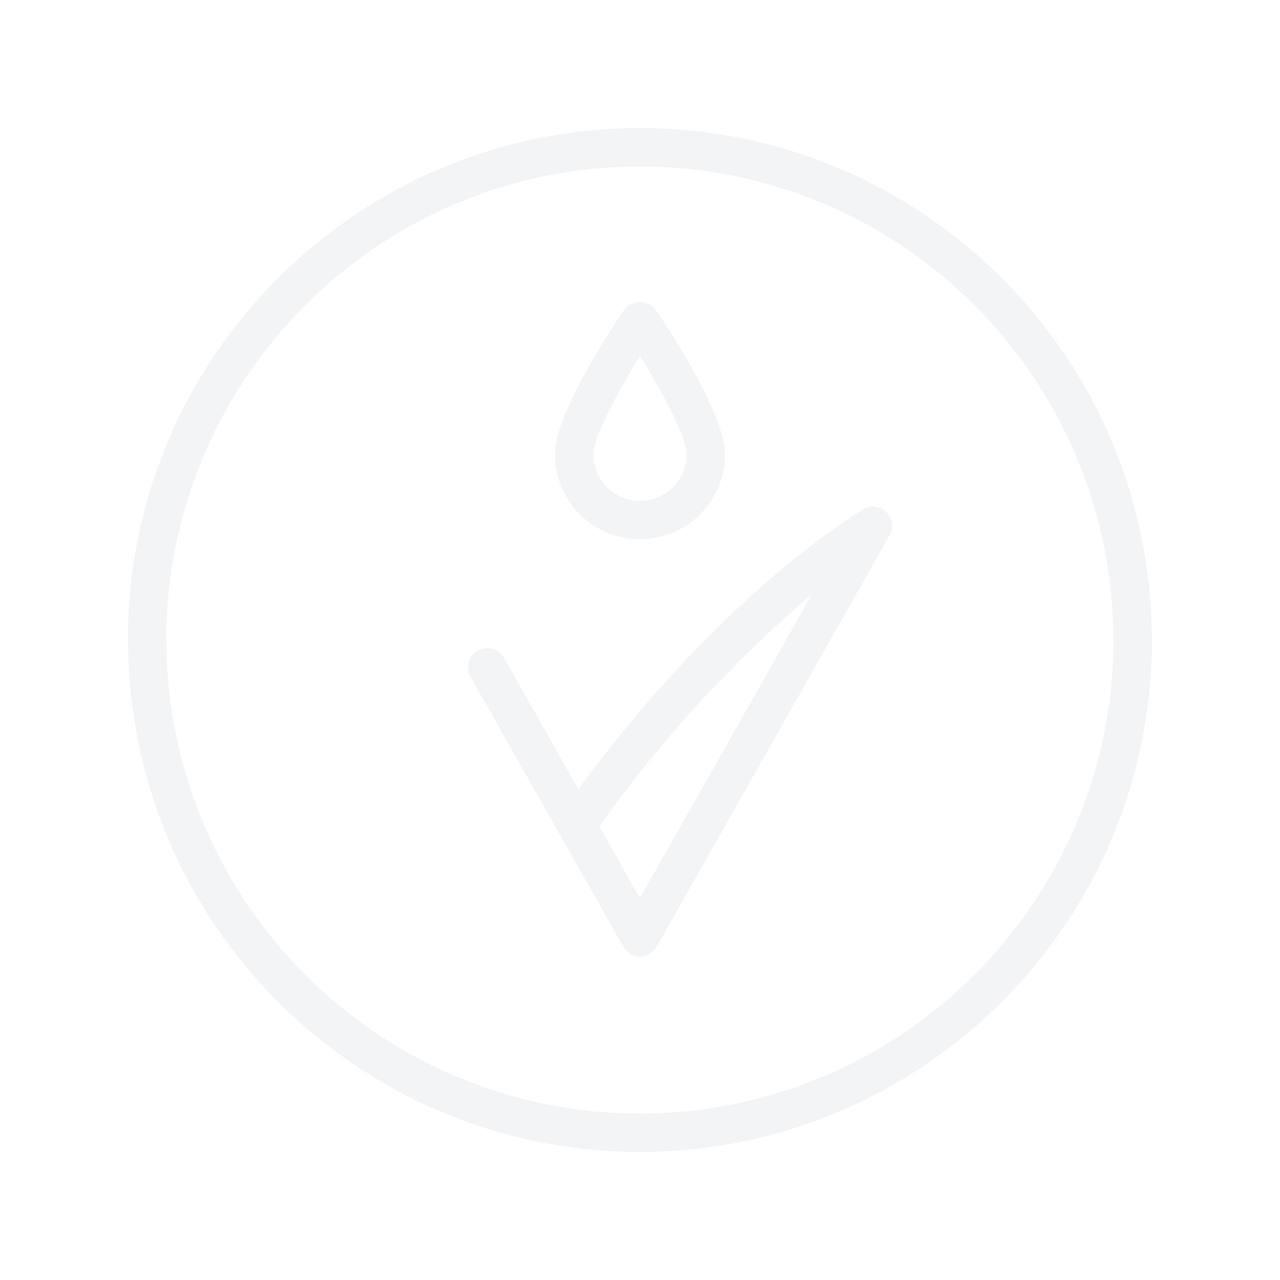 GOSH Brow Pomade Waterproof 4ml